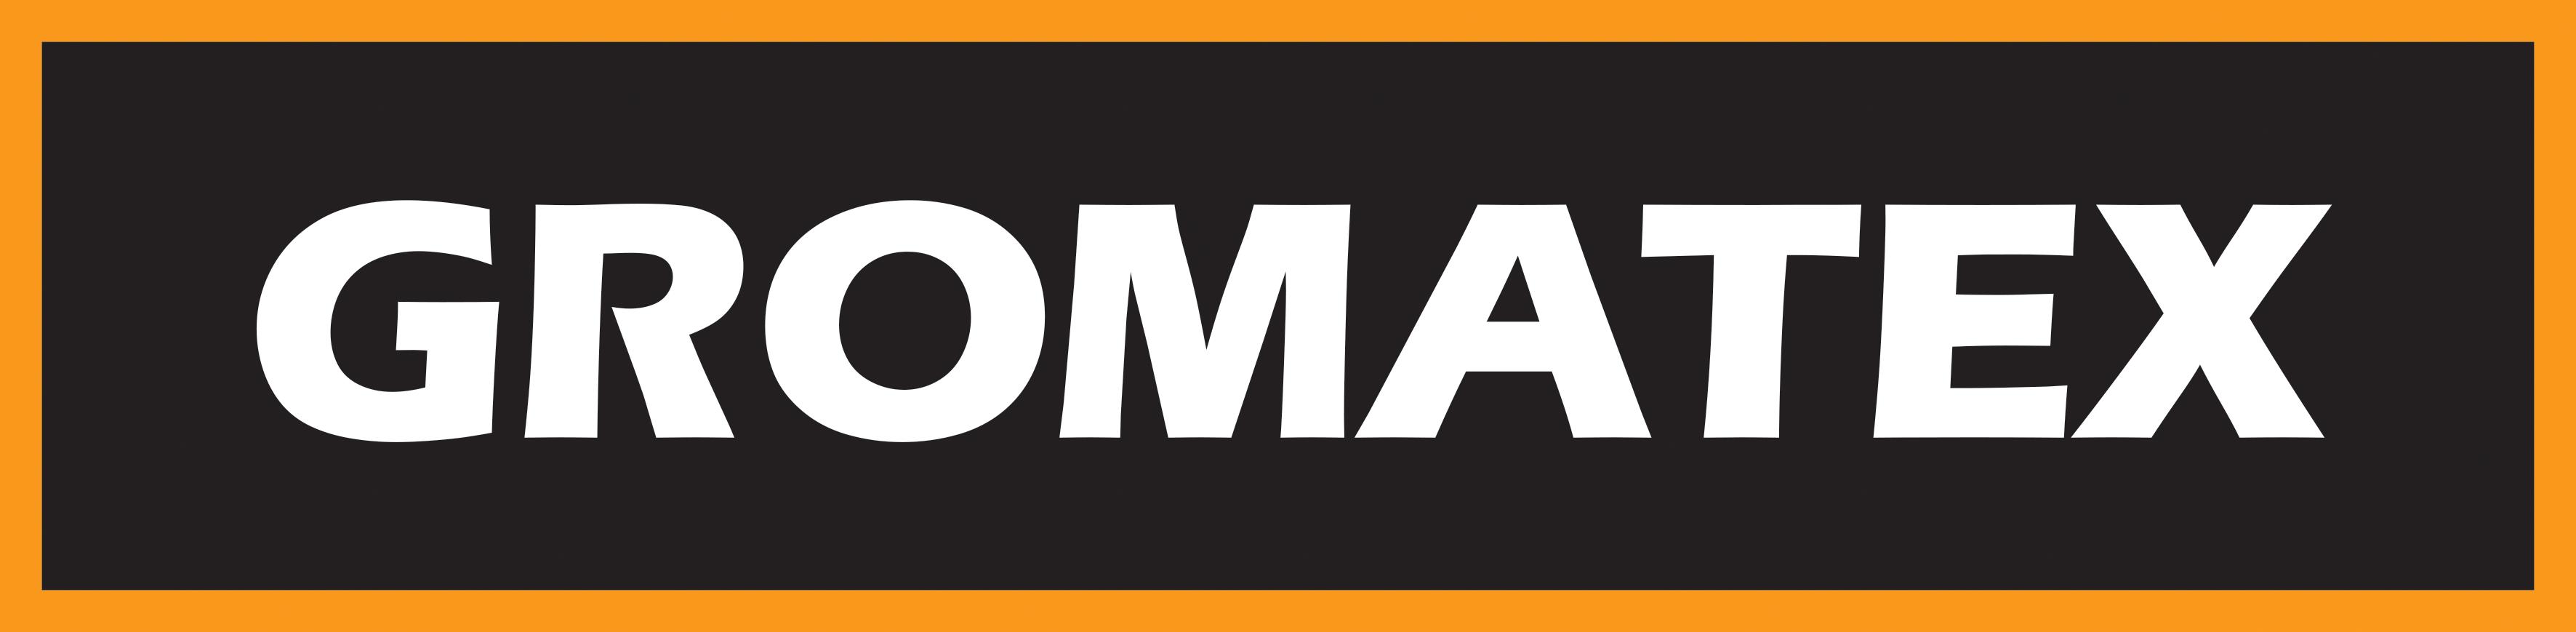 Gromatex